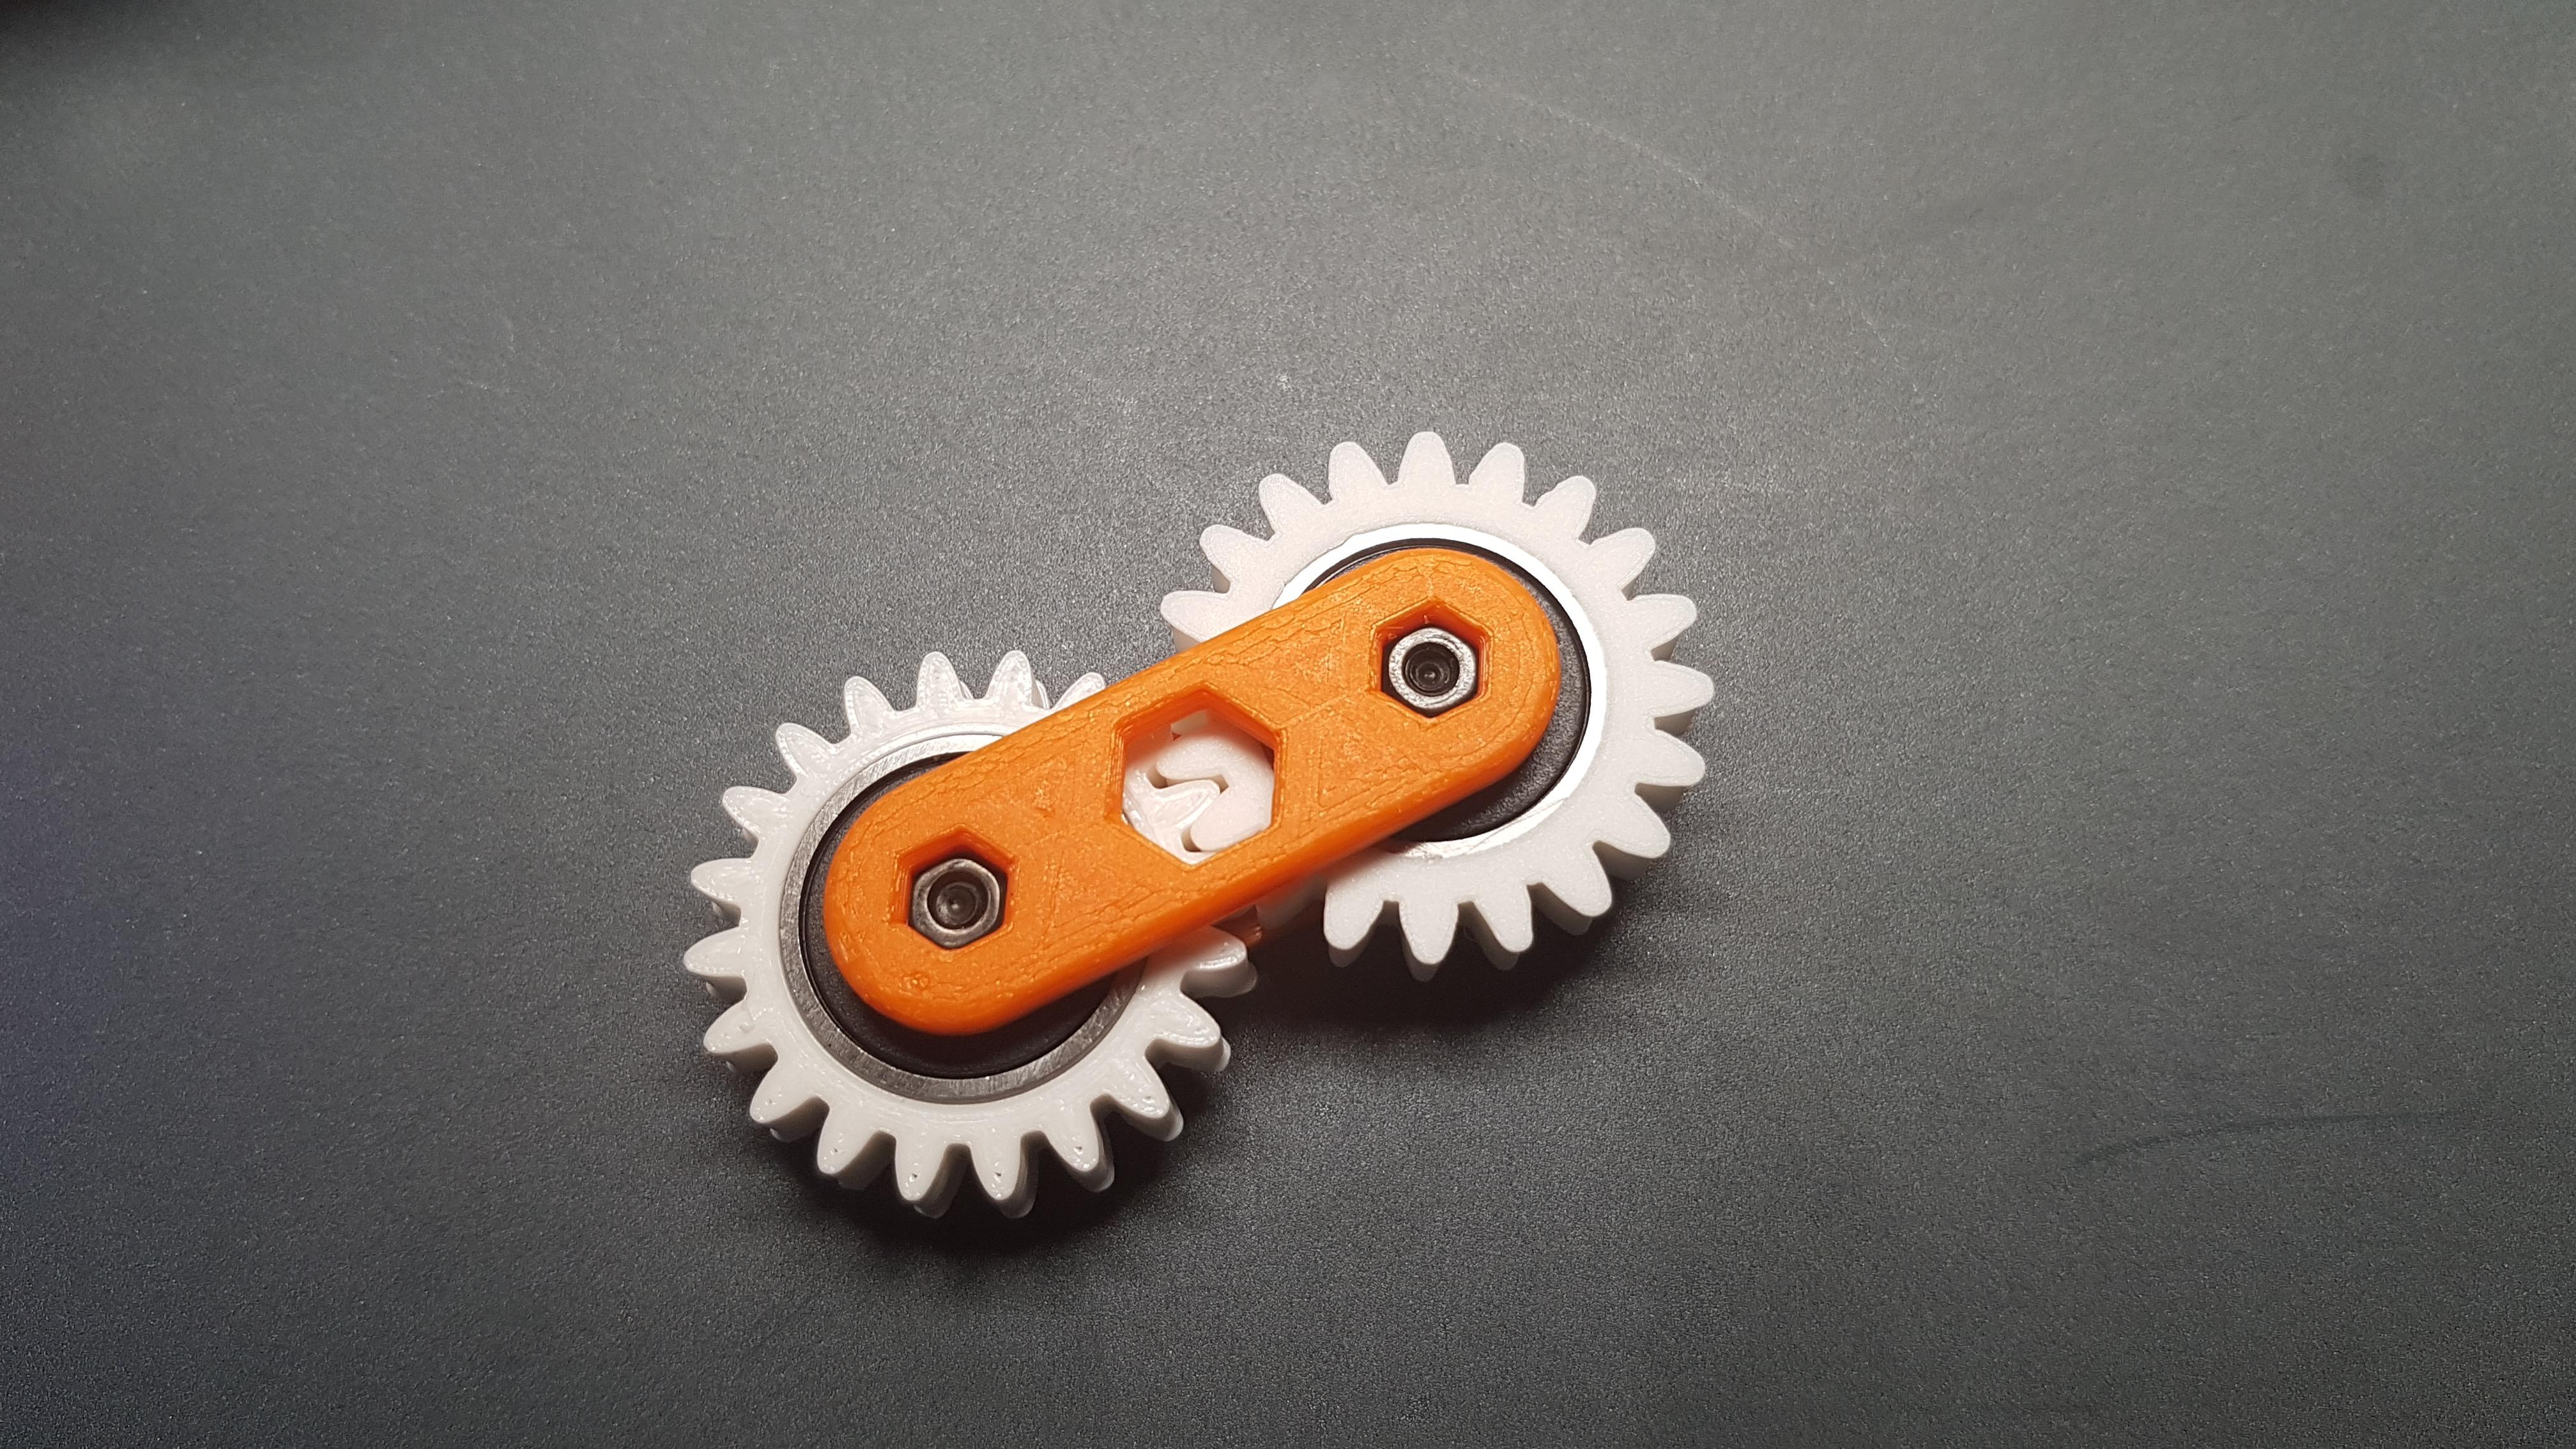 20191011_203534.jpg Download free STL file Fidget toy • 3D print object, seb2320